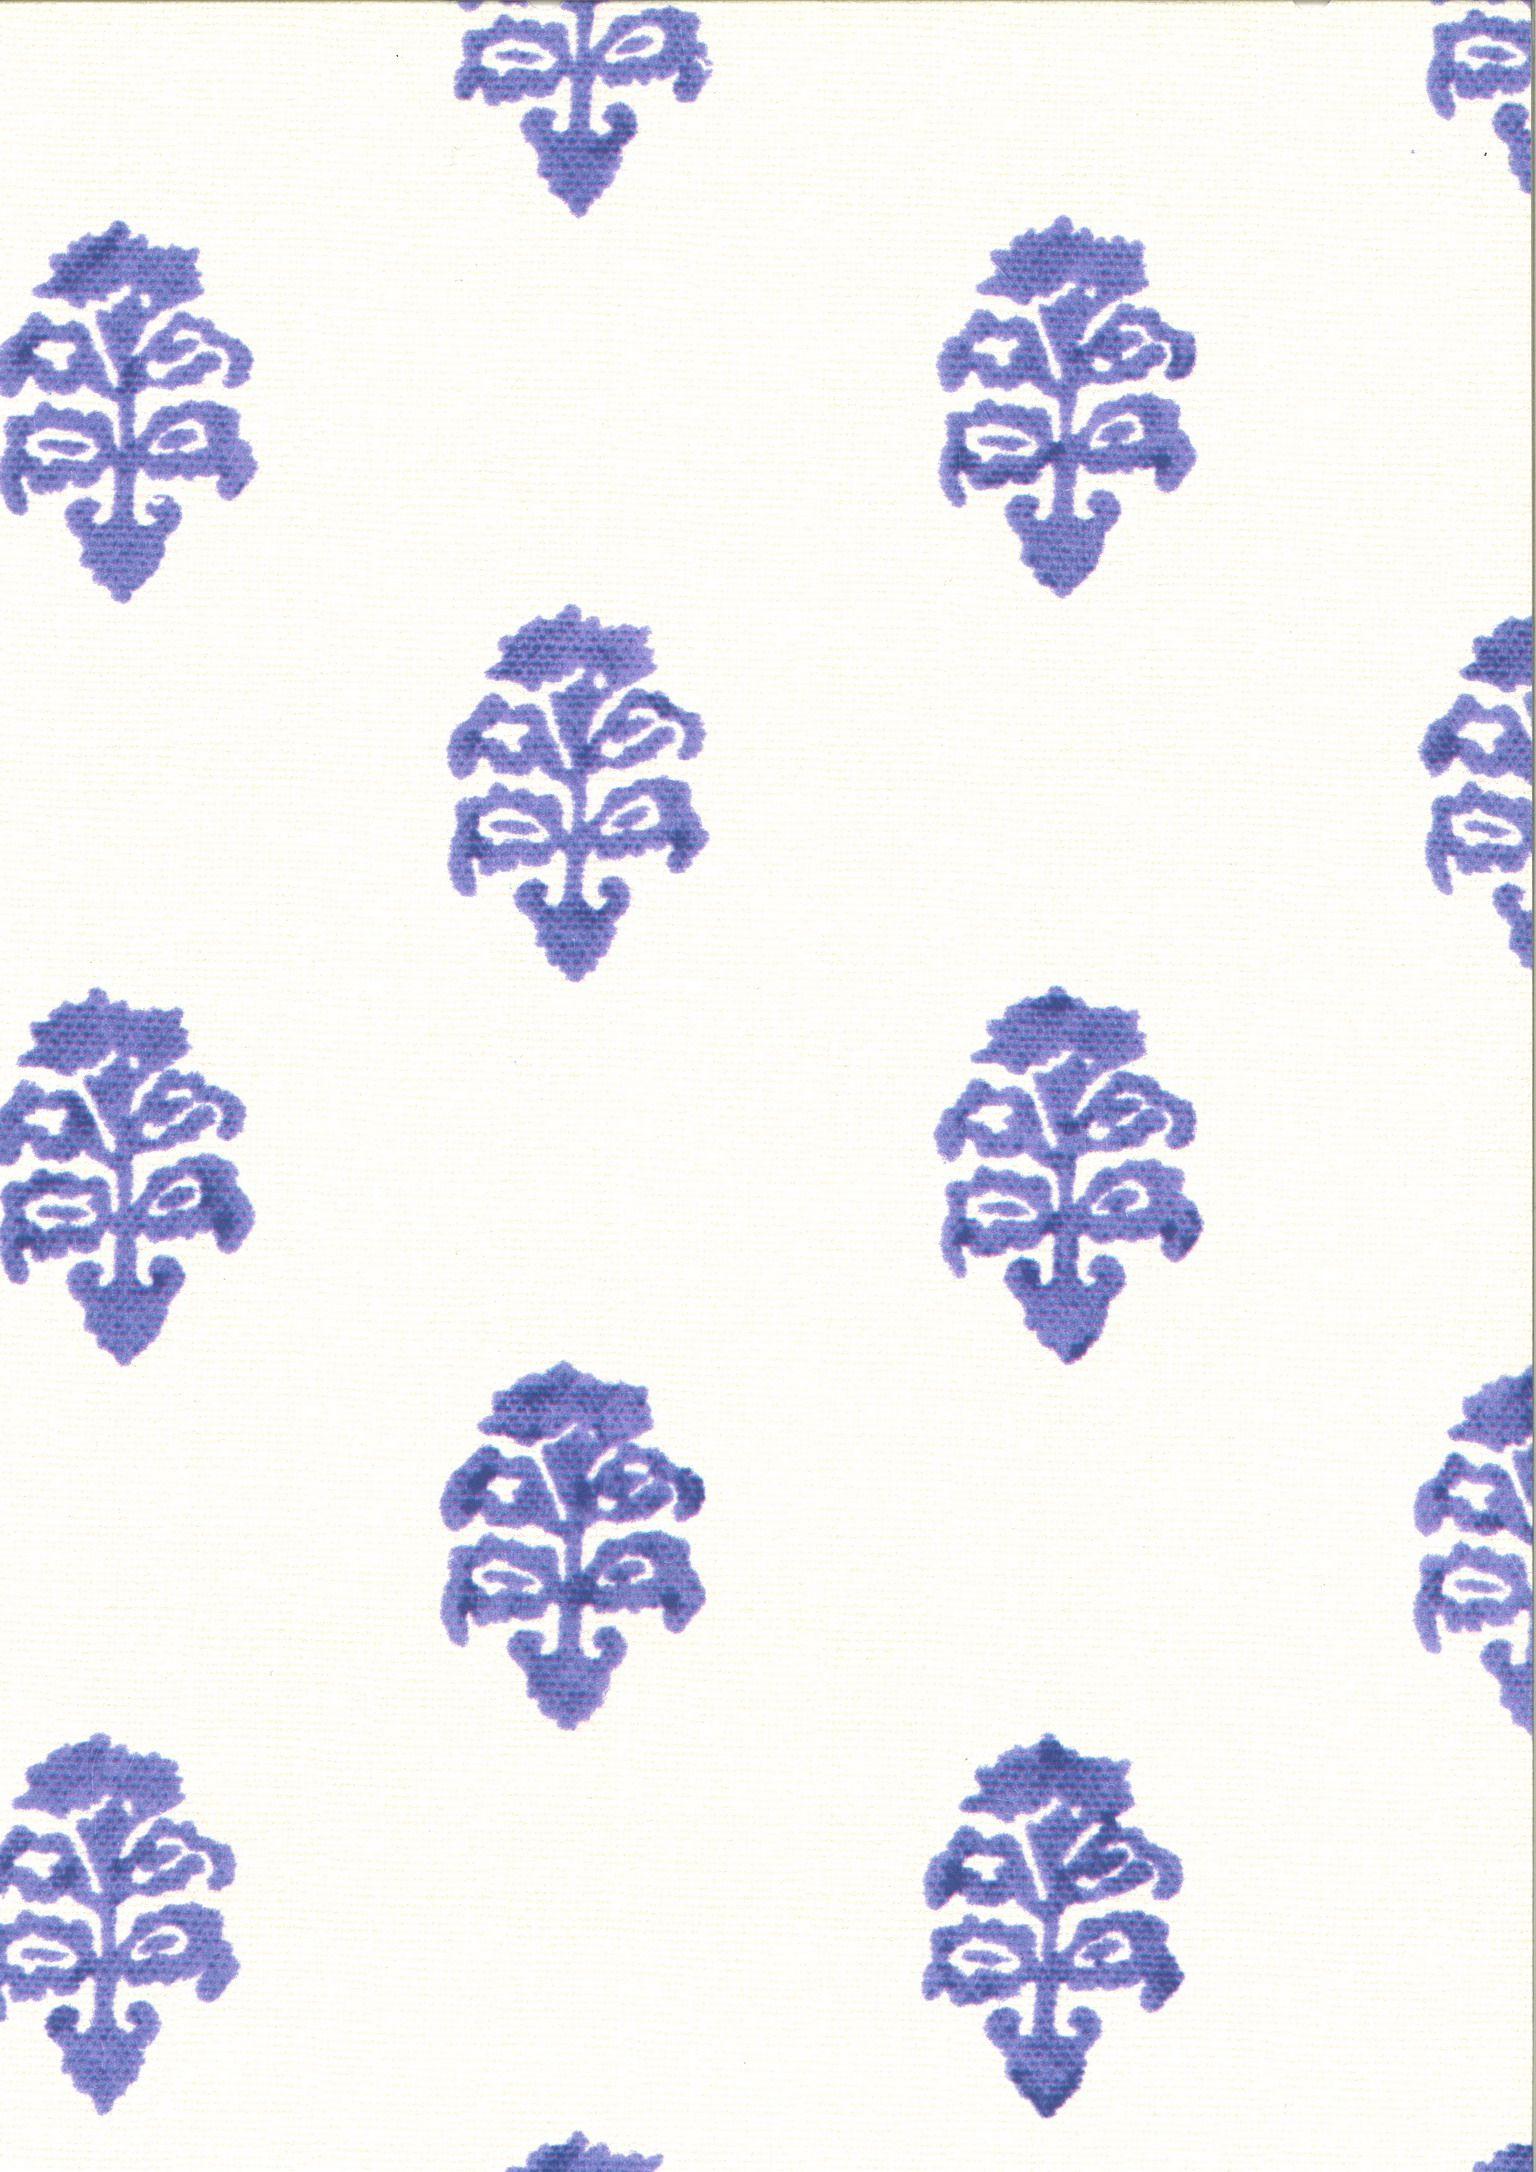 Artichoke in Amethyst ivory #purple #wallpaper #interiordesign #designinspiration #thetextilefiles #clothandkindinteriordesign #c&cmilano